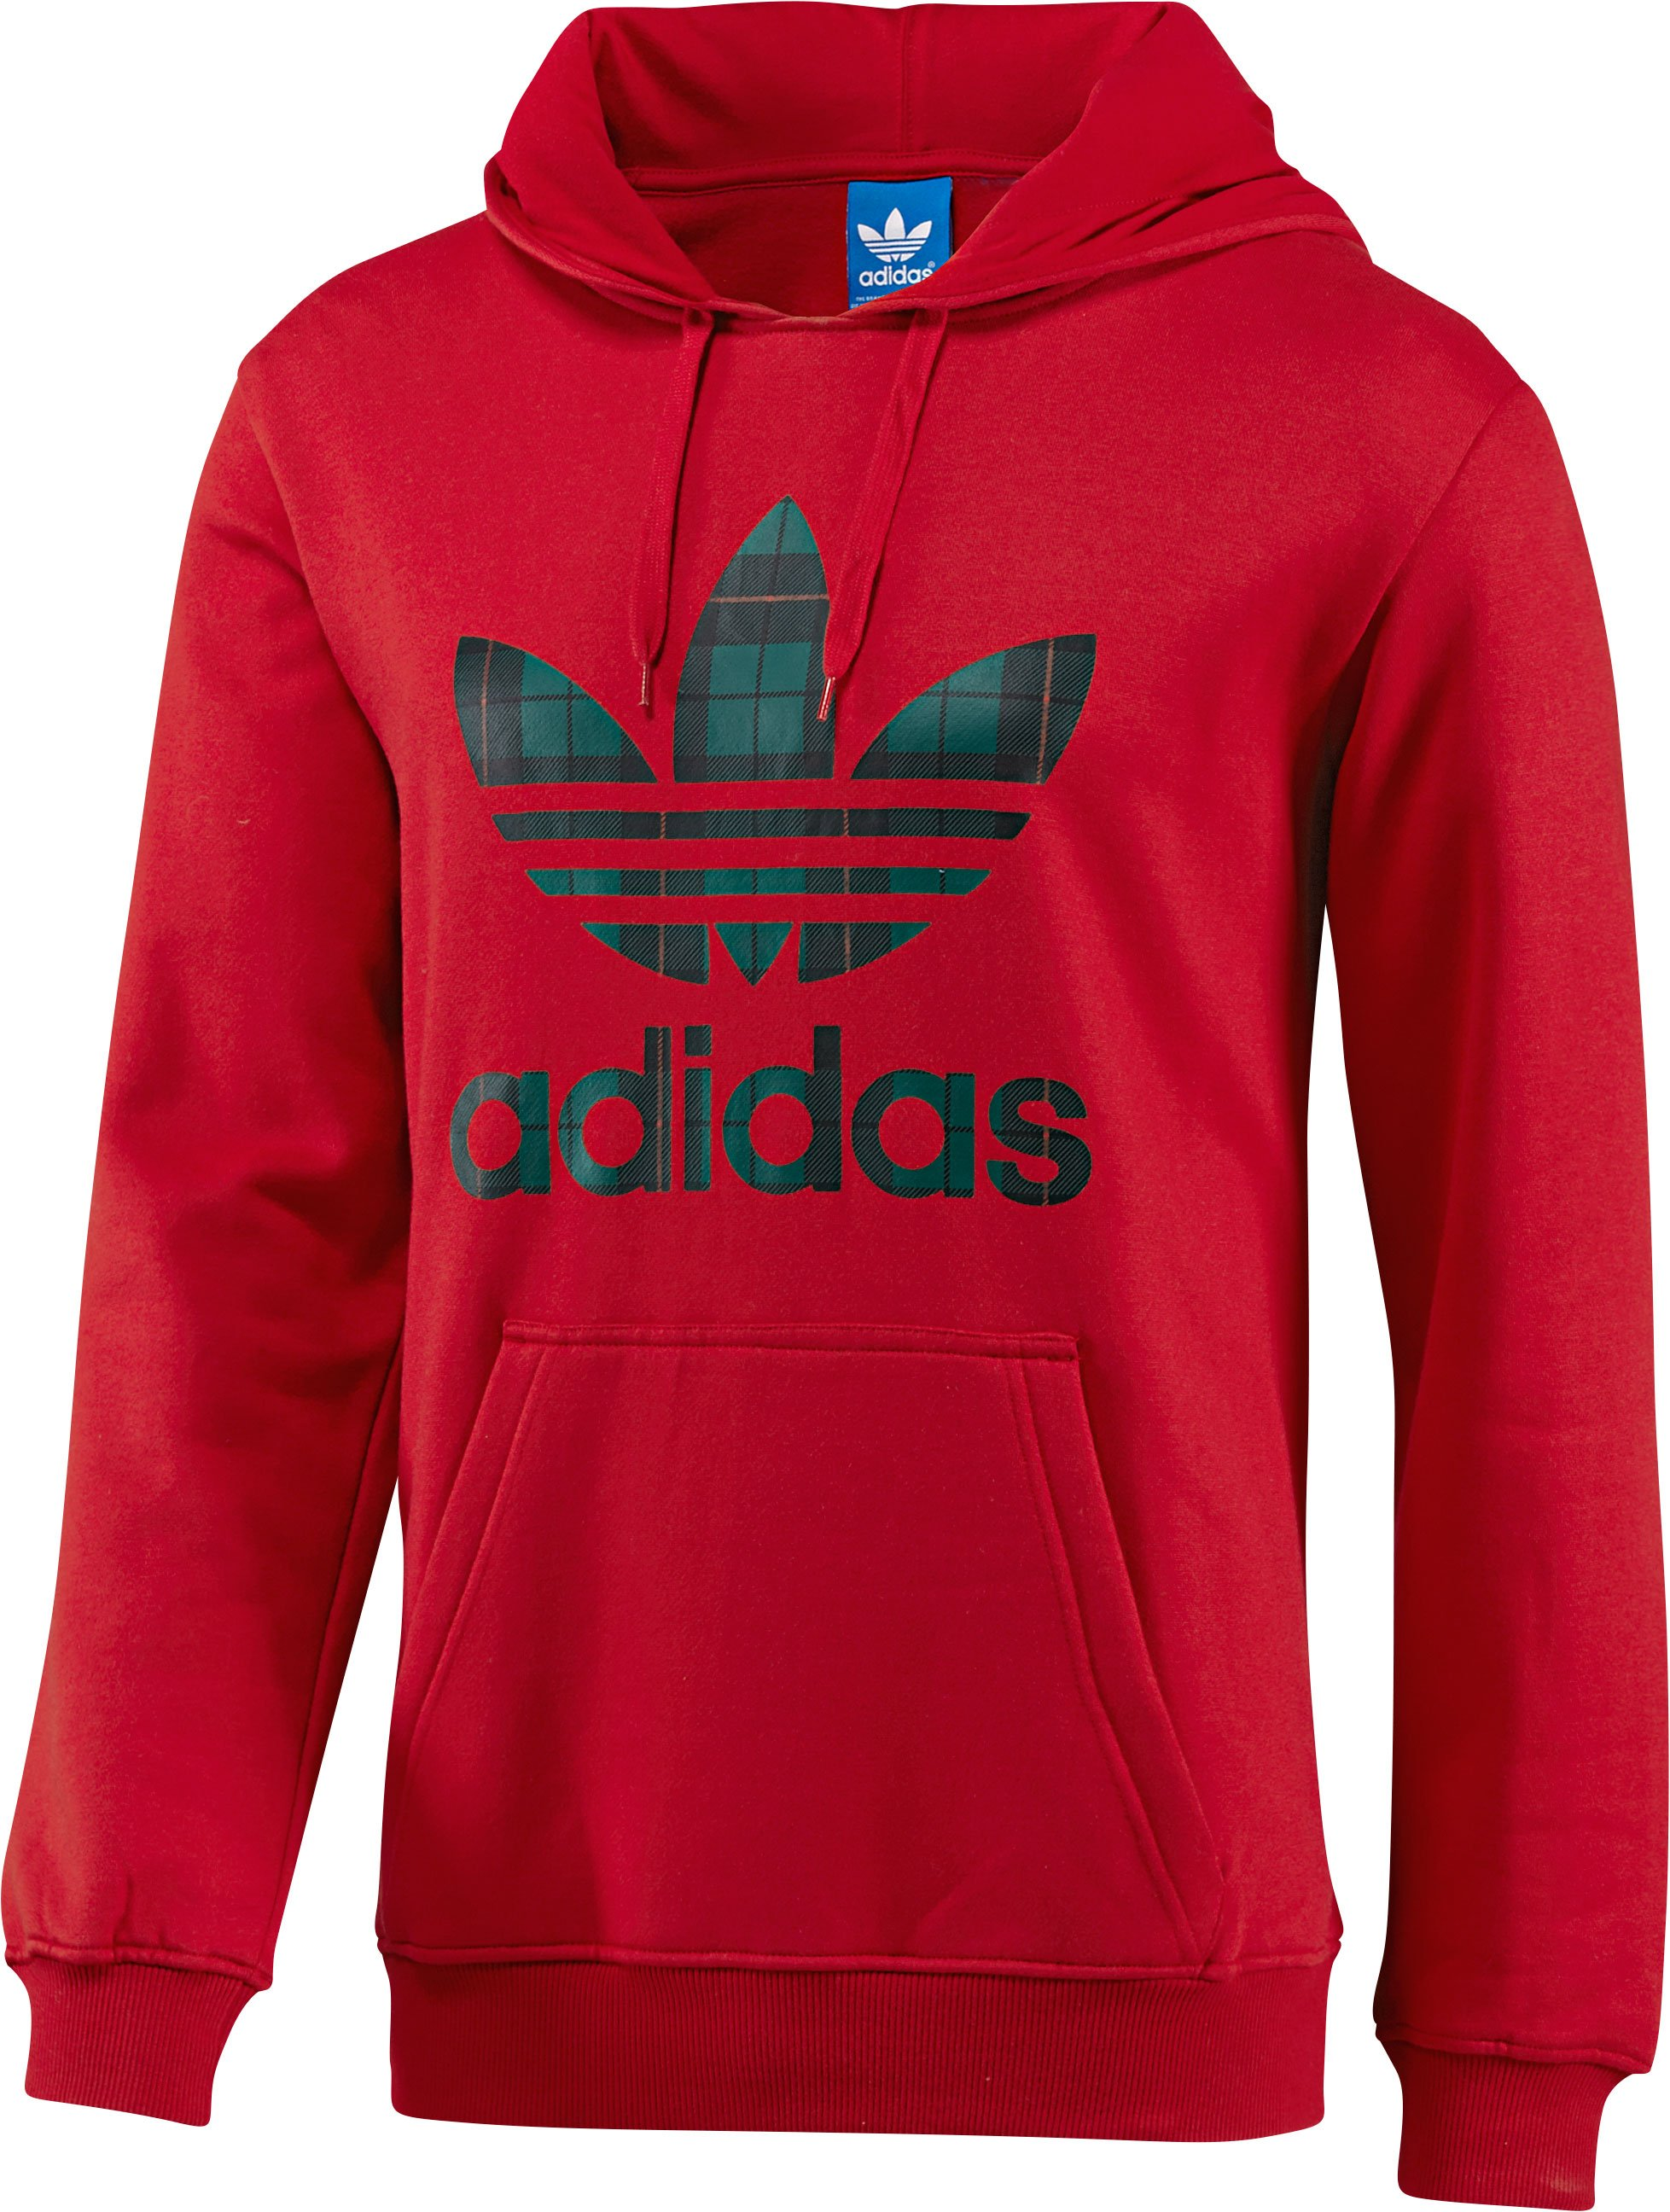 Adidas originals Adidas adi trefoil hoodie herre fra billigsport24